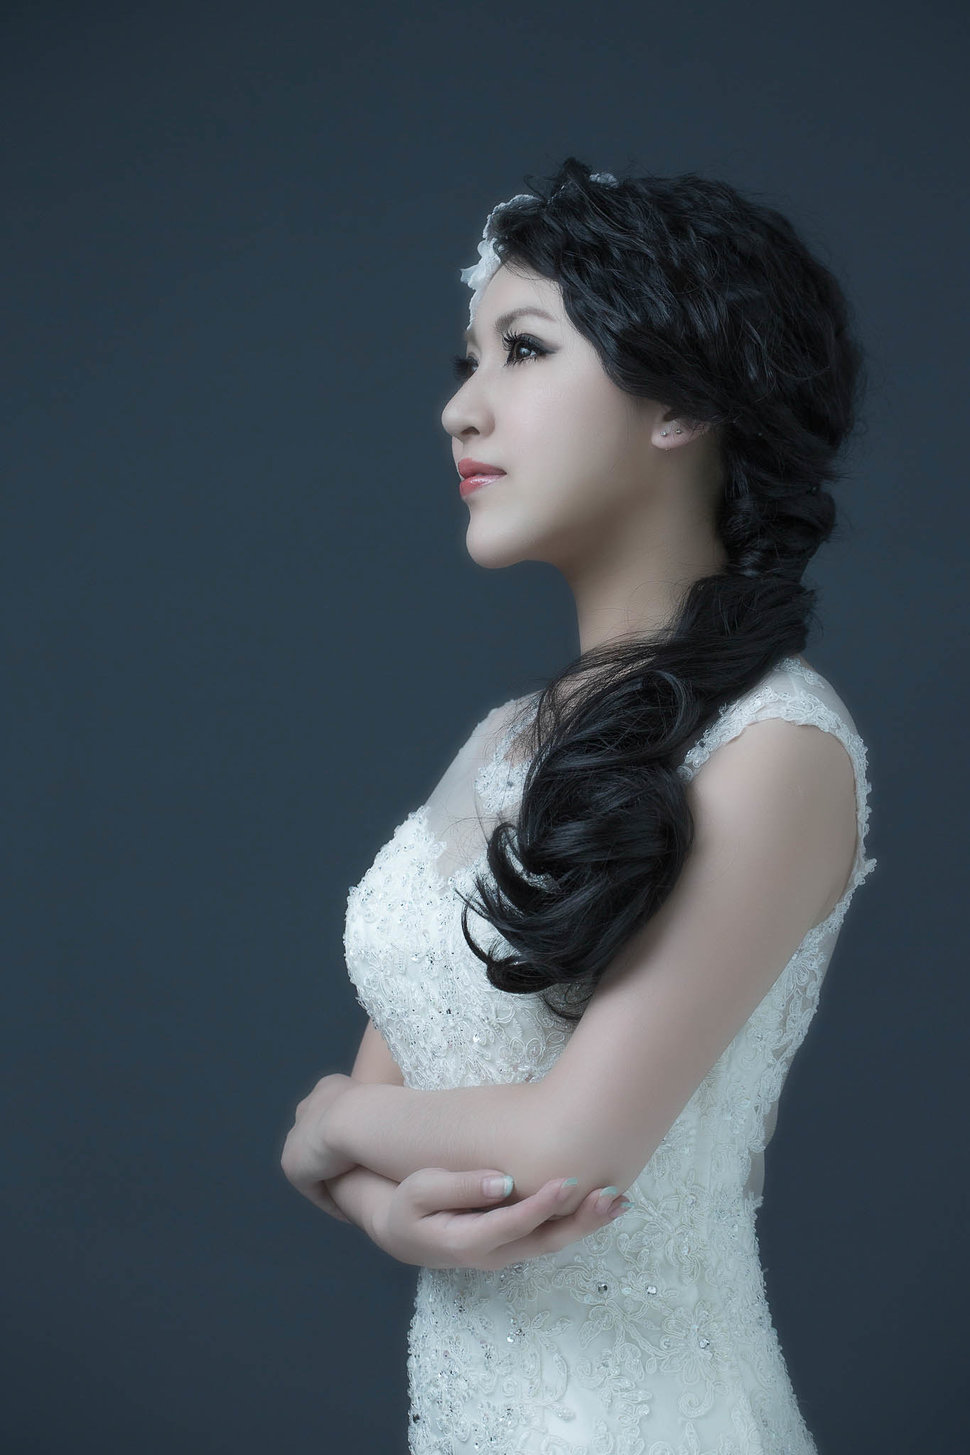 18PHOTO自主婚紗-深邃(編號:214887) - 18PHOTO 婚紗影像攝影工作室 - 結婚吧一站式婚禮服務平台